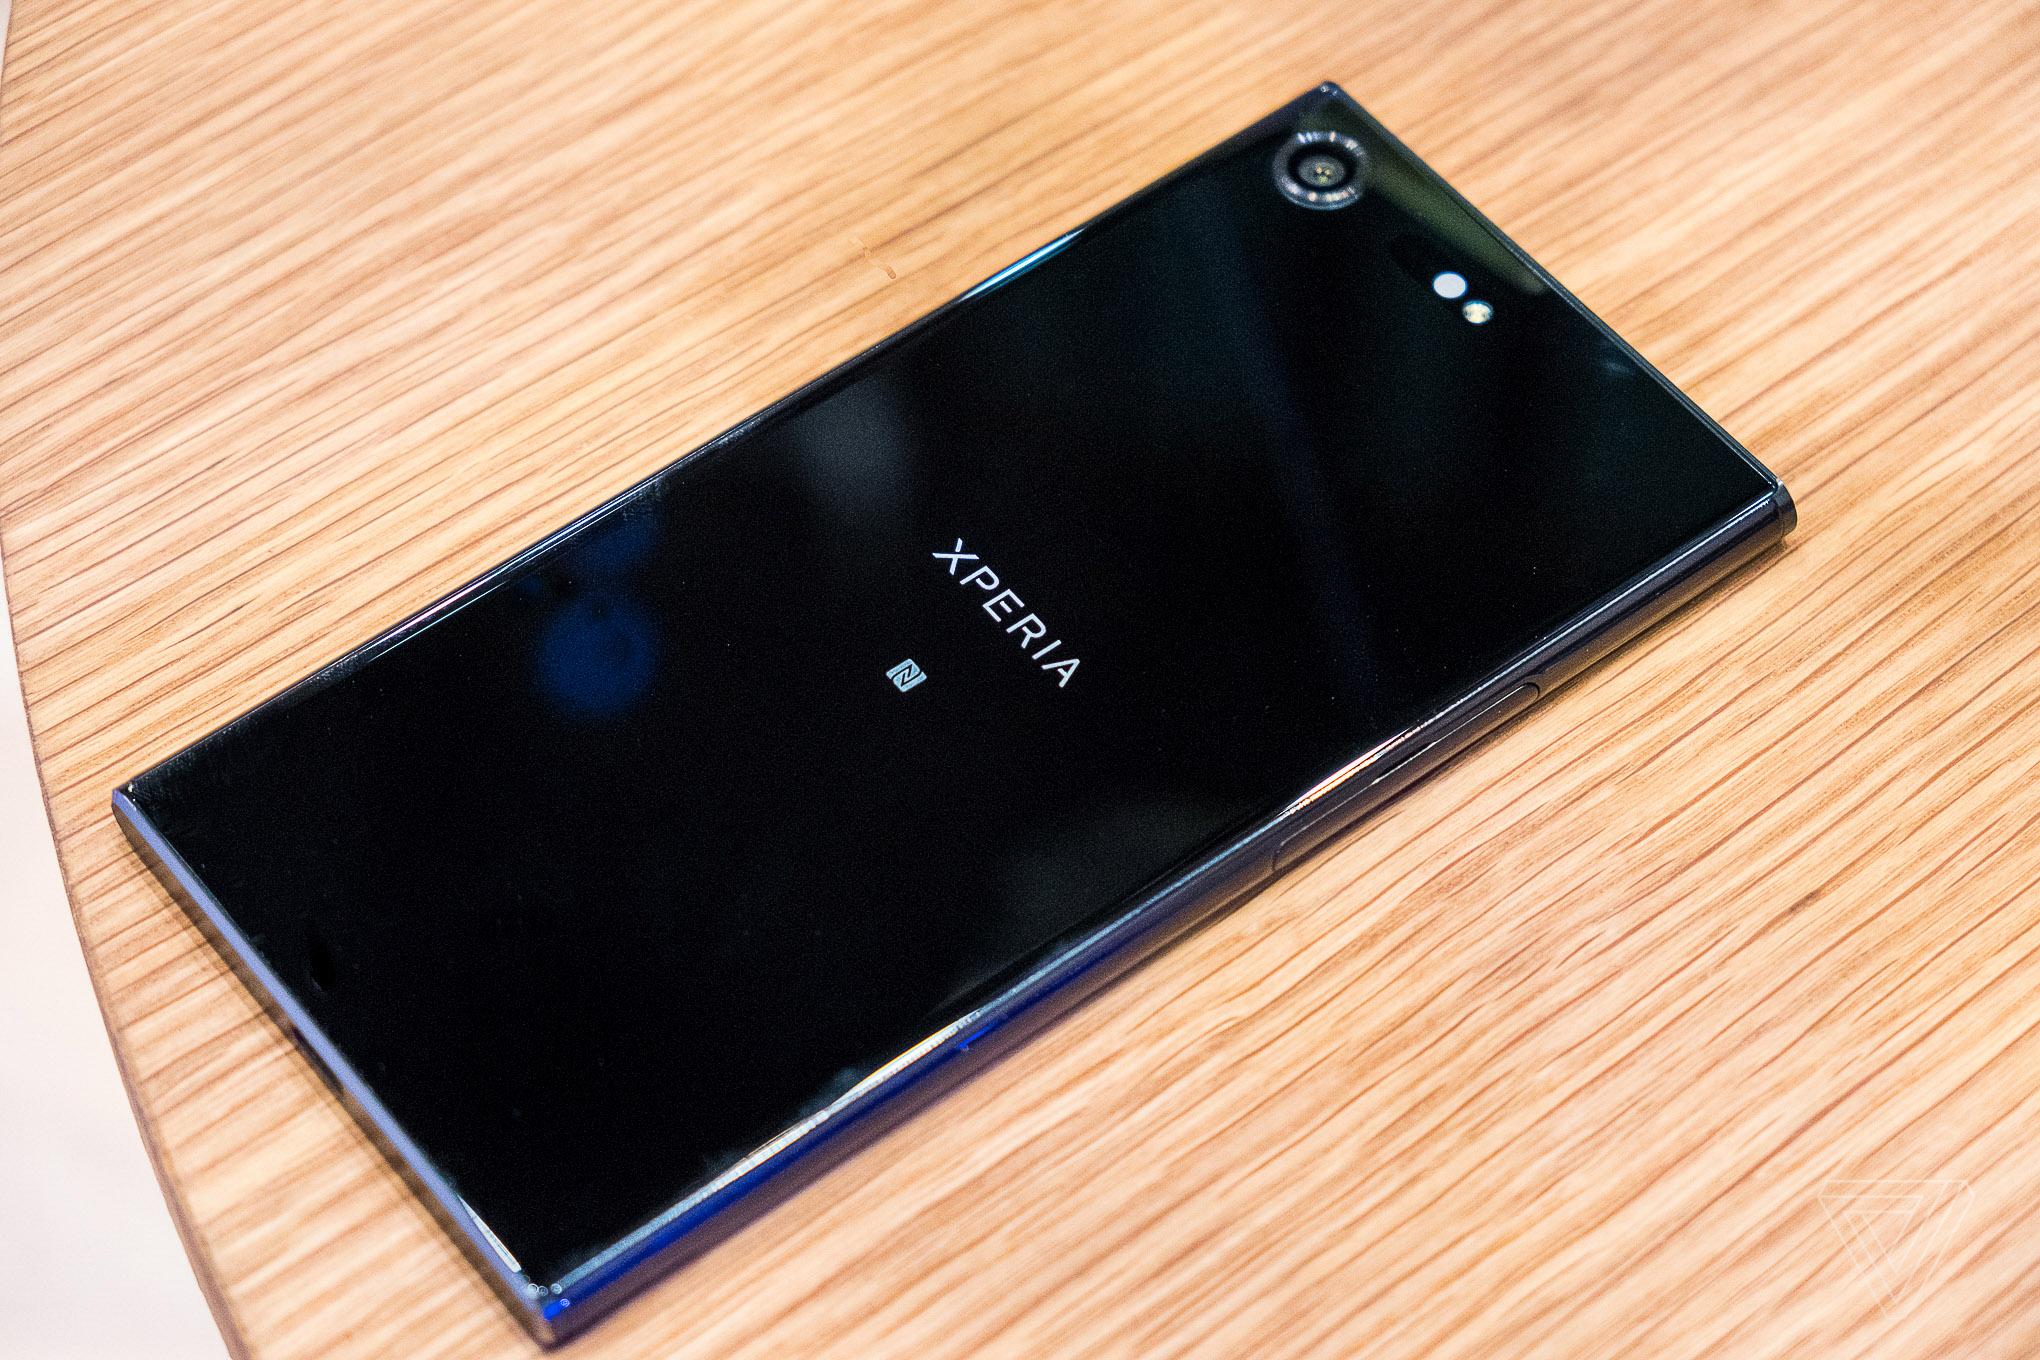 Sony Xperia XZ Premium announced: 4K HDR screen, memory ...